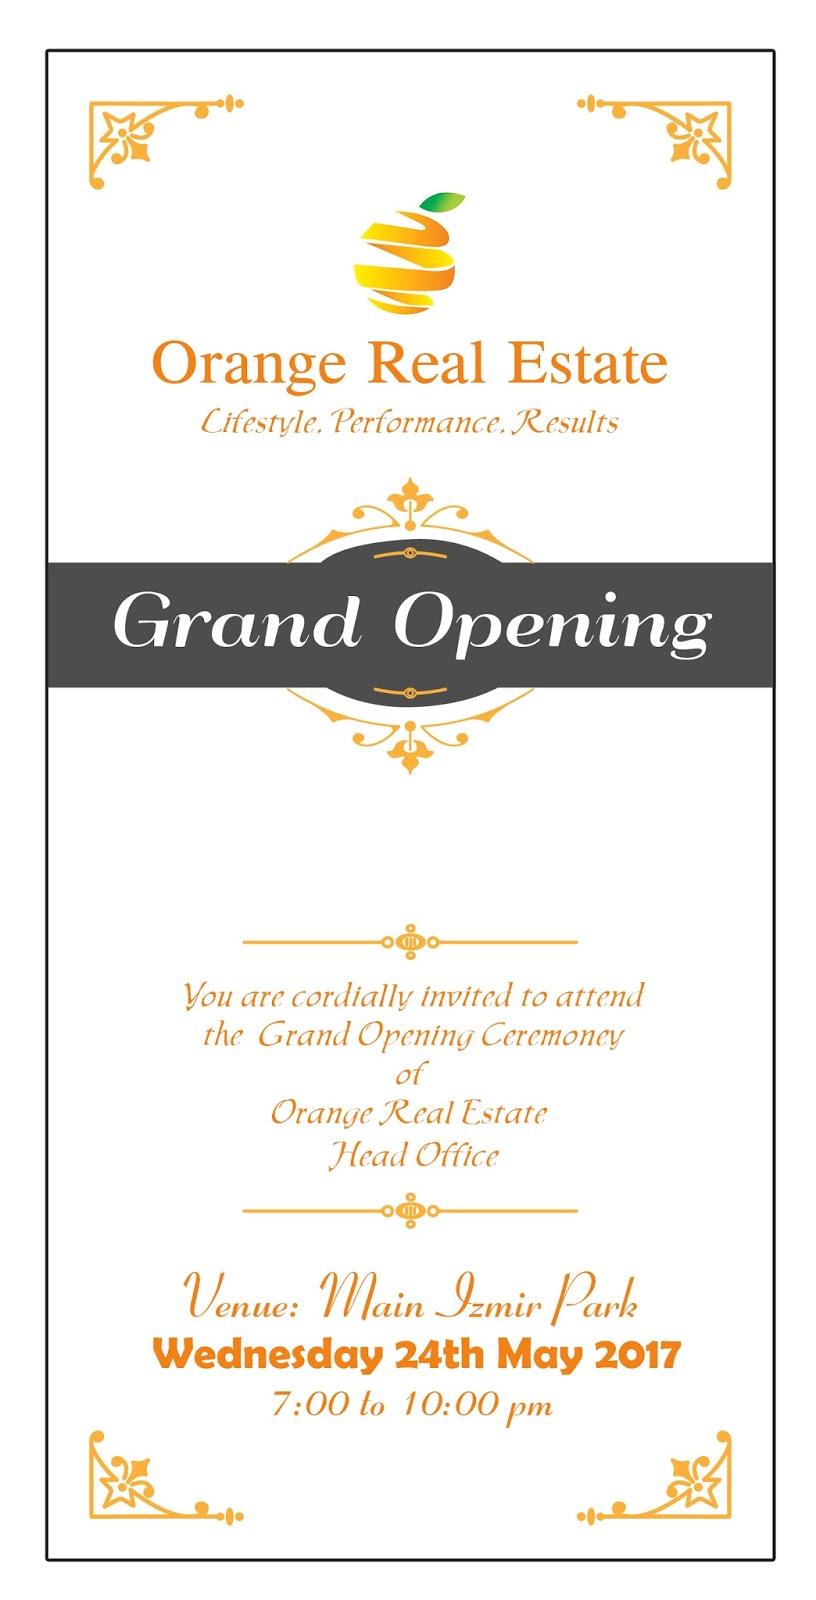 grand opening ceremony invitation card orange real estate by asad